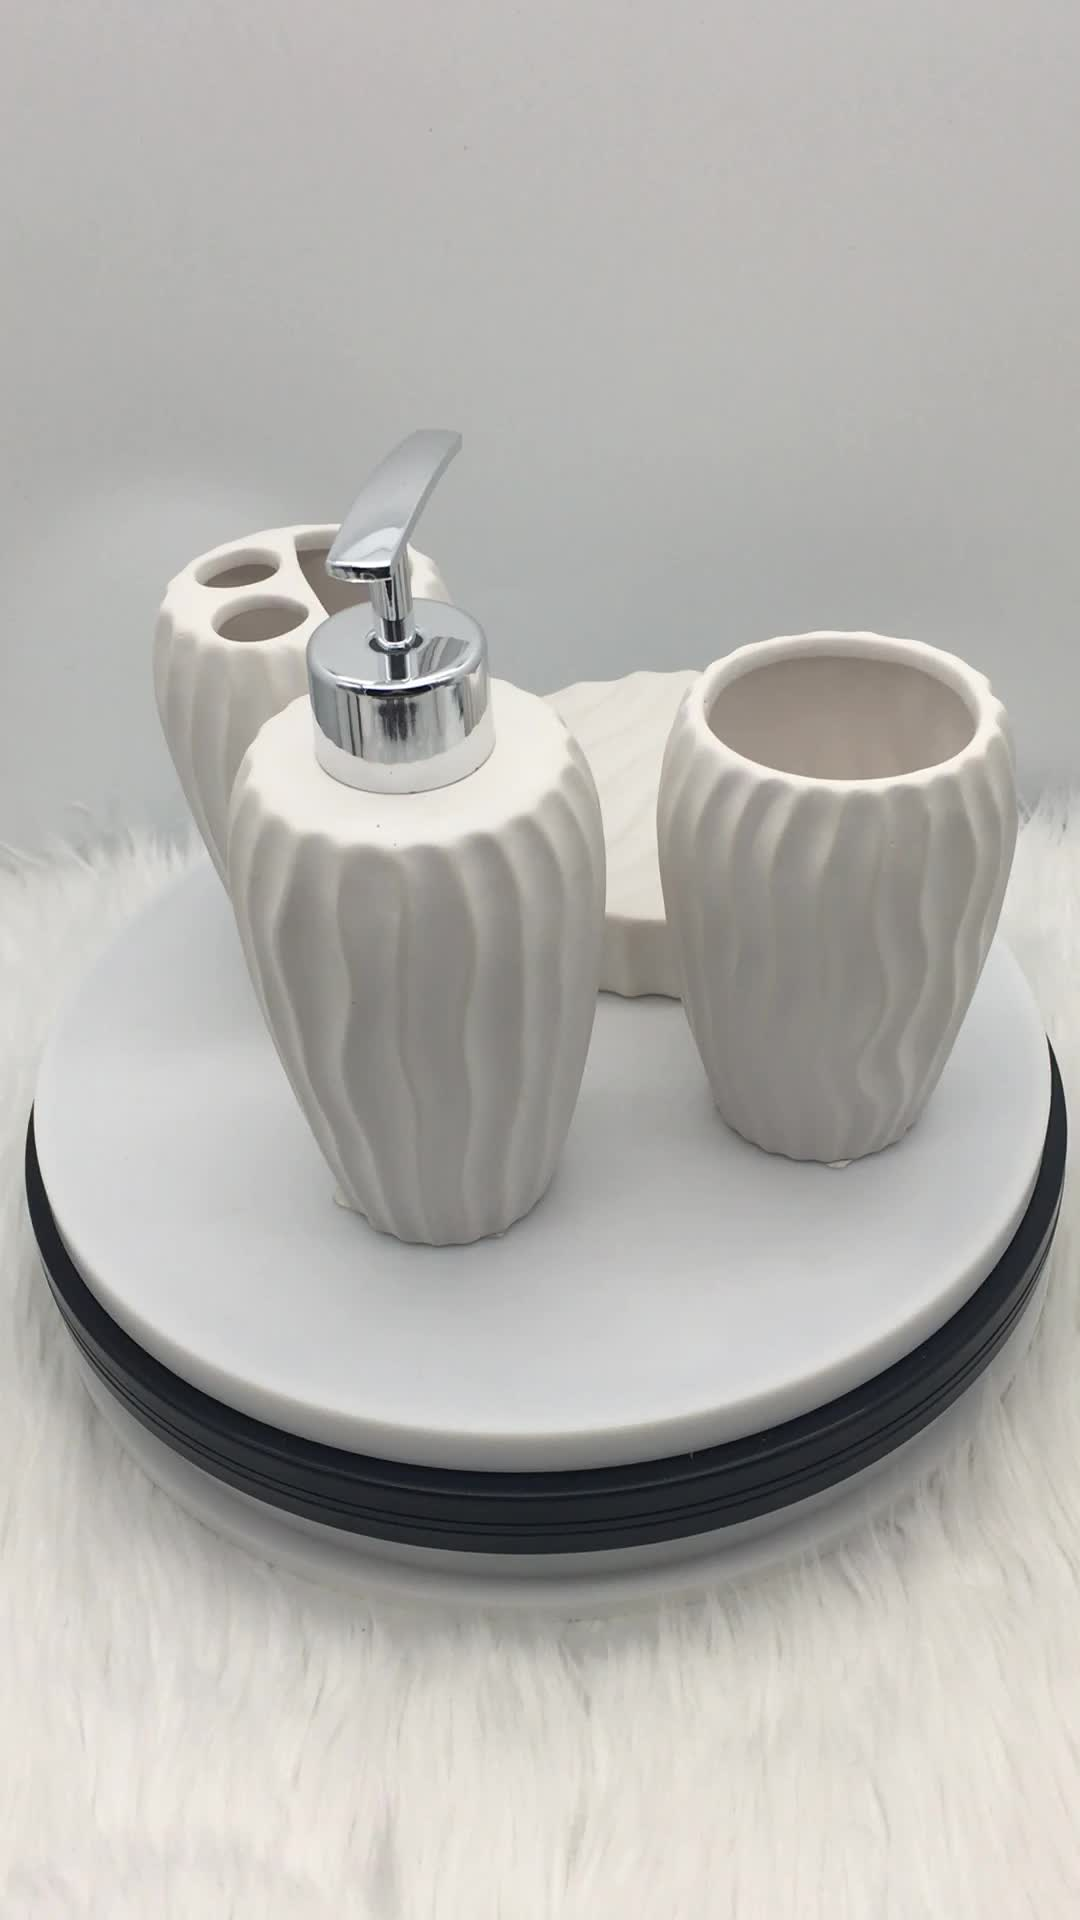 Cheap price eco friendly porcelain bathroom set ceramic - Where to buy bathroom accessories ...